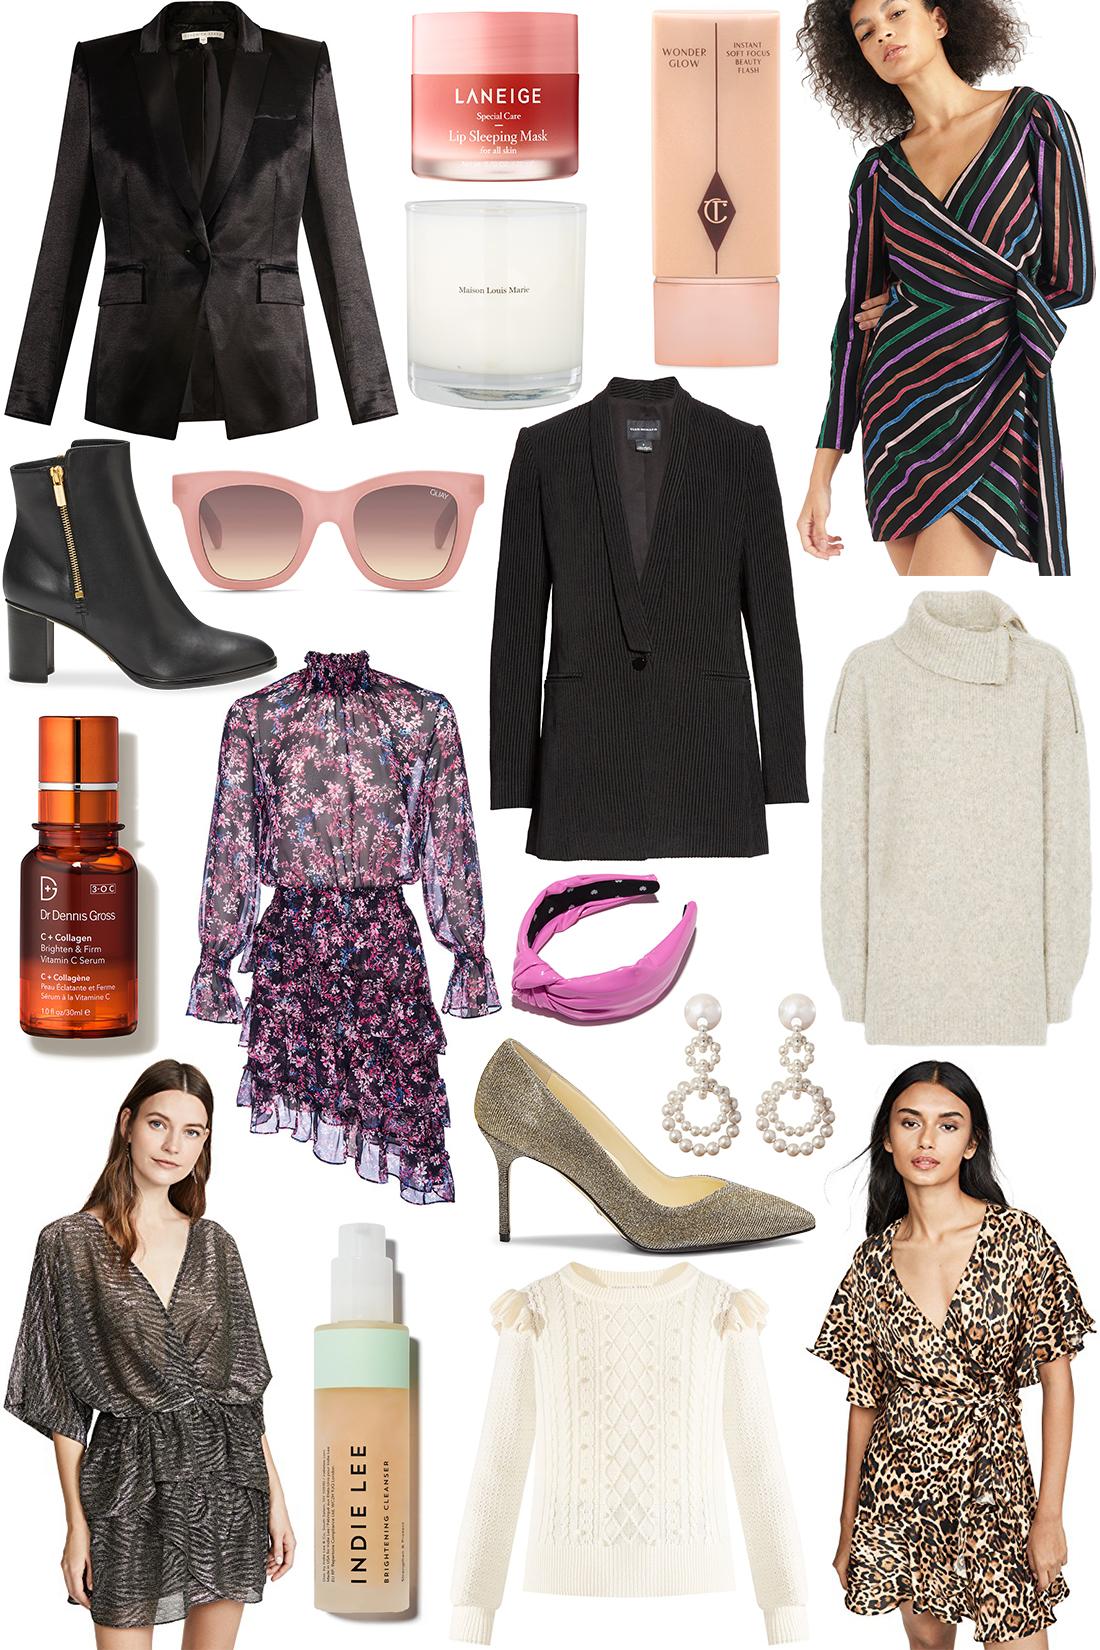 Short Wrap Dresses | A Few Recent Favorites